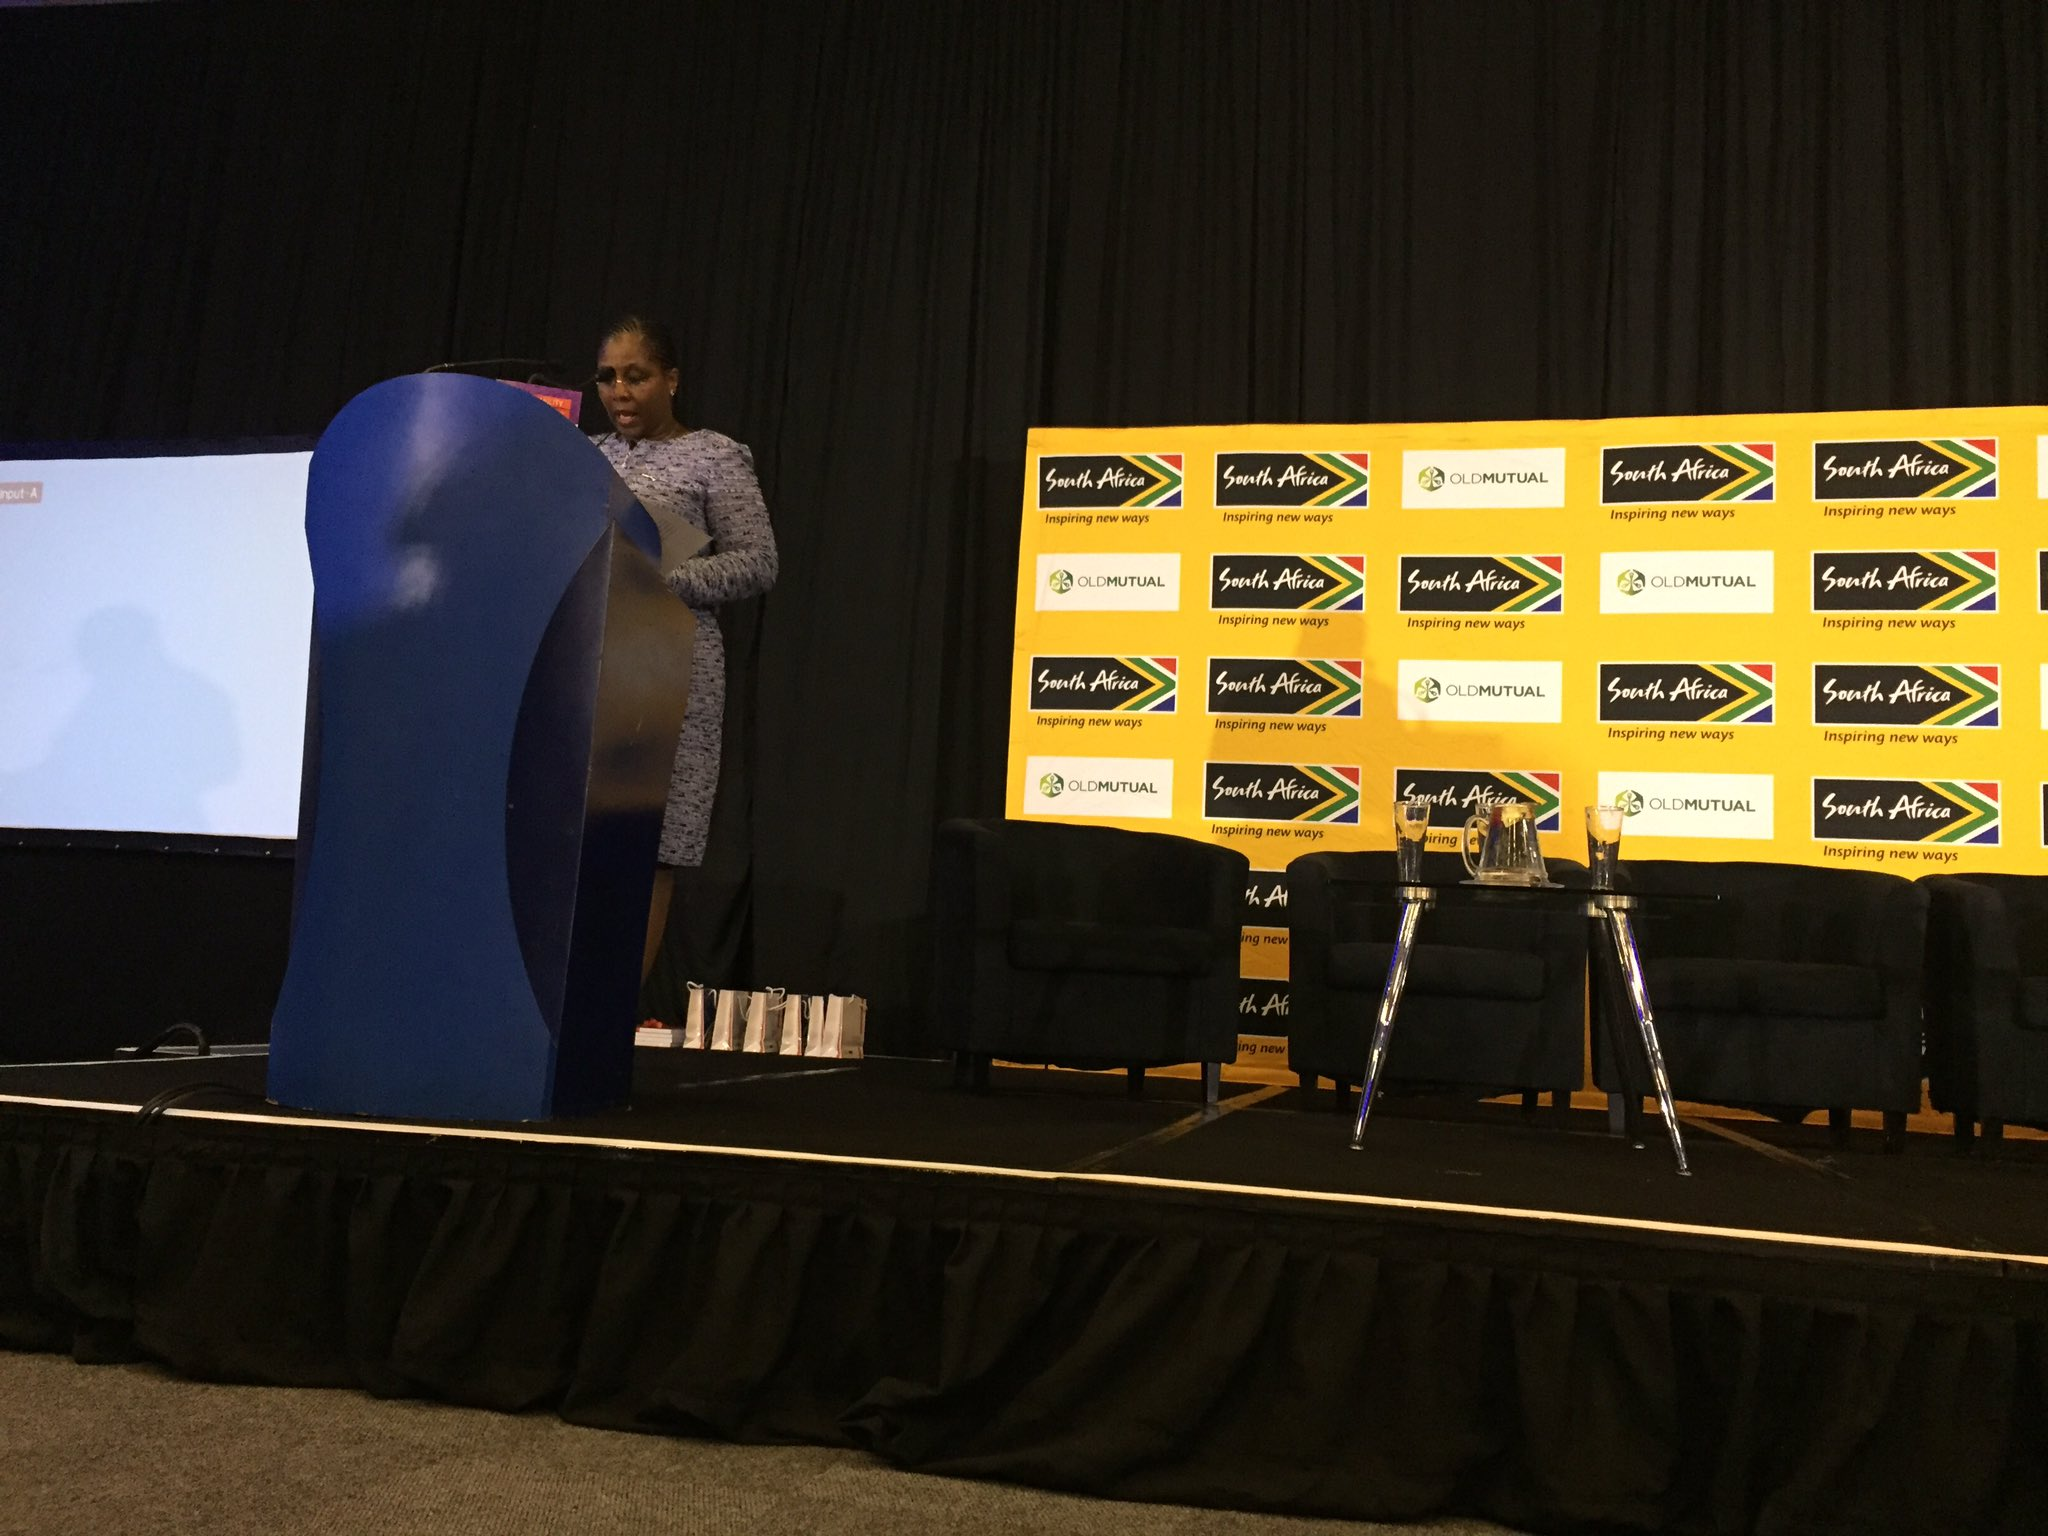 Minister addresses @brand_sa breakfast forum on the youth & digital revolution #connectingAfrica https://t.co/HW8IdFRtfP